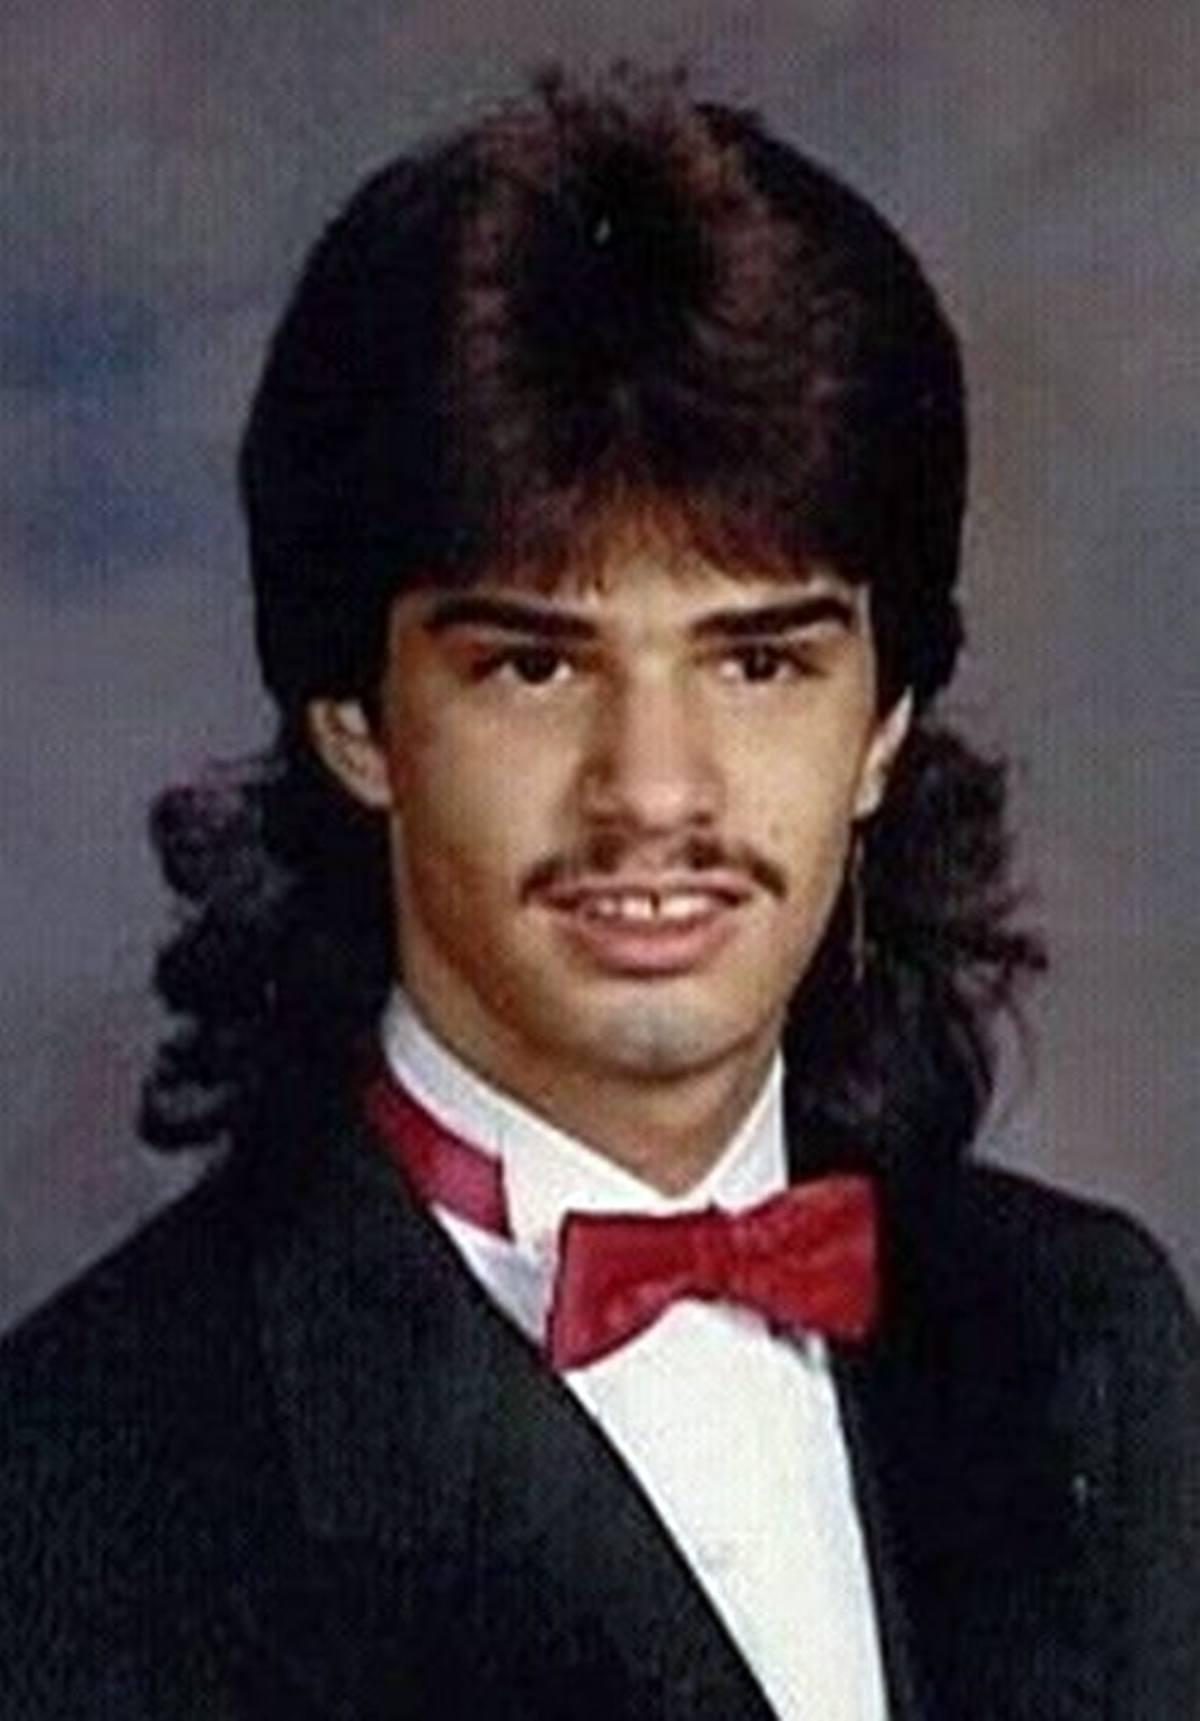 13 15 Hilariously Awkward Yearbook Photos